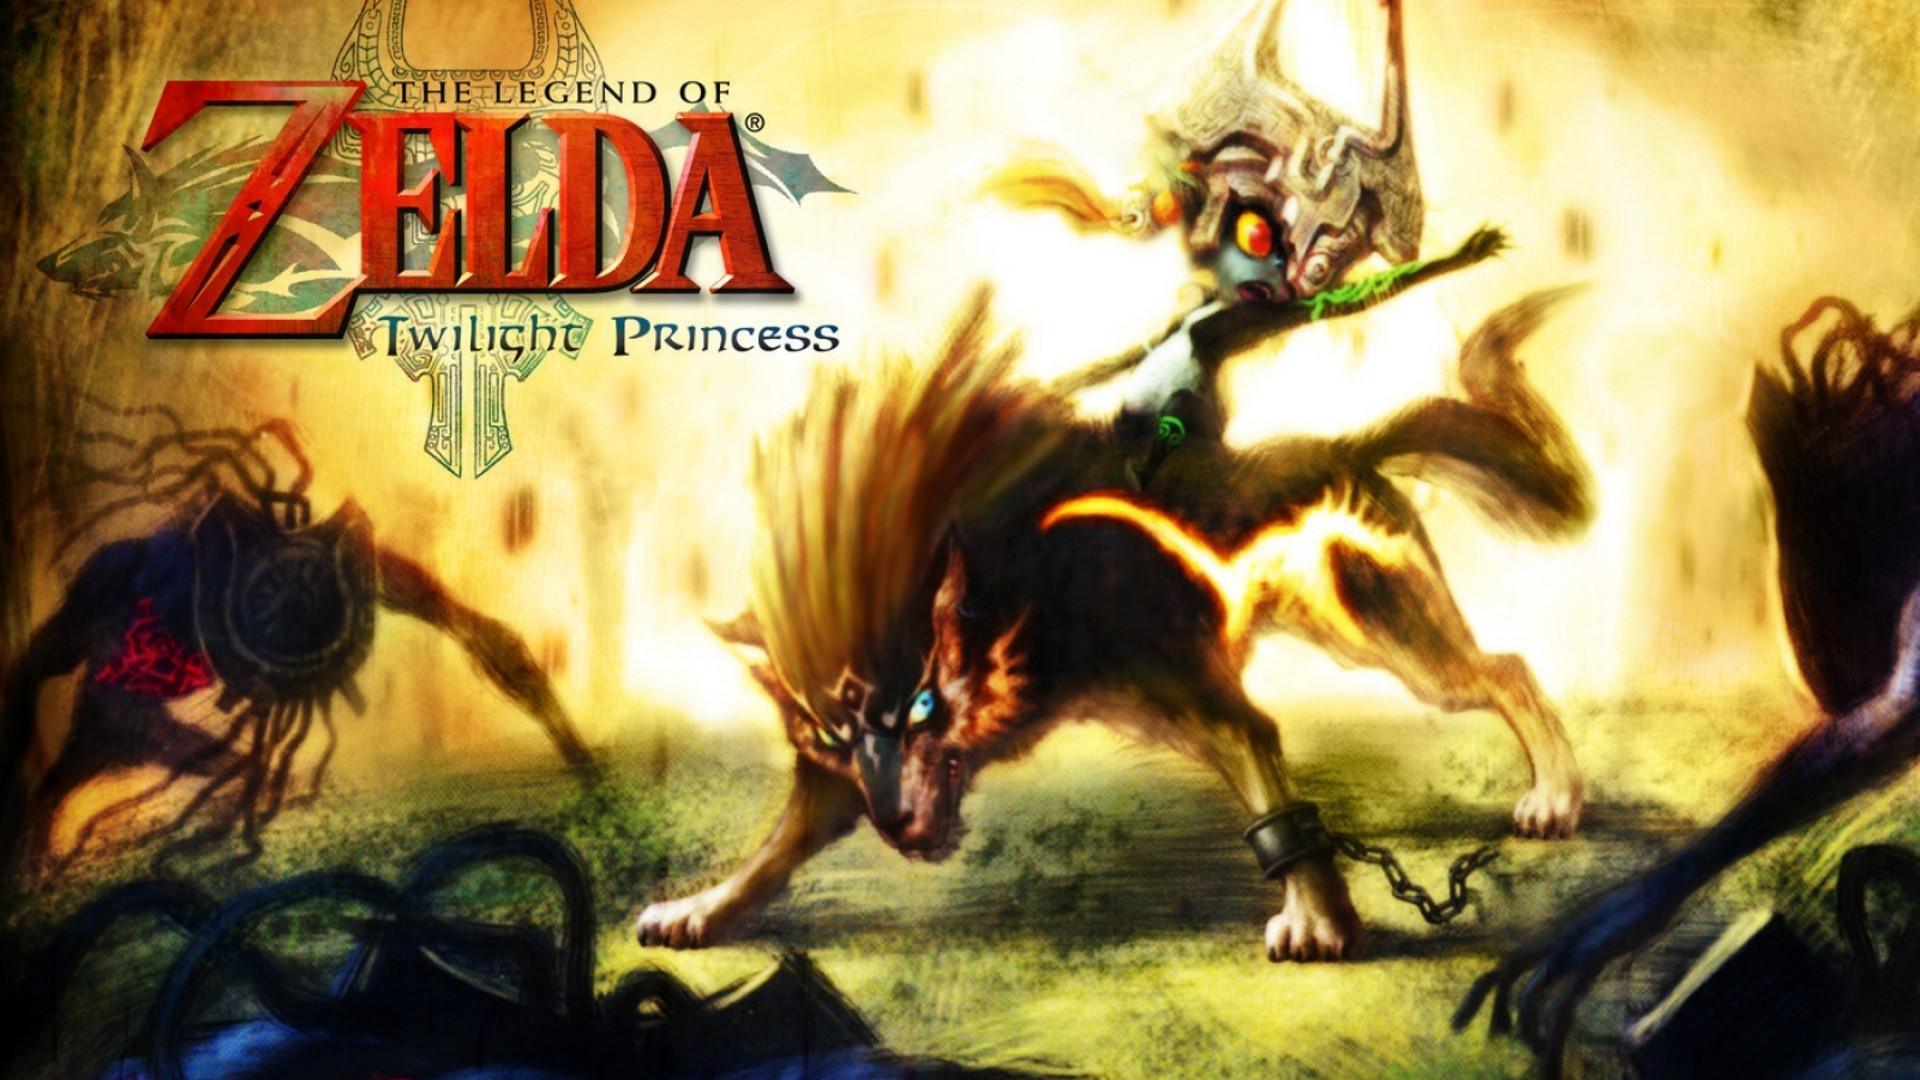 The Legend Of Zelda Twilight Princess Wallpaper Download Free.